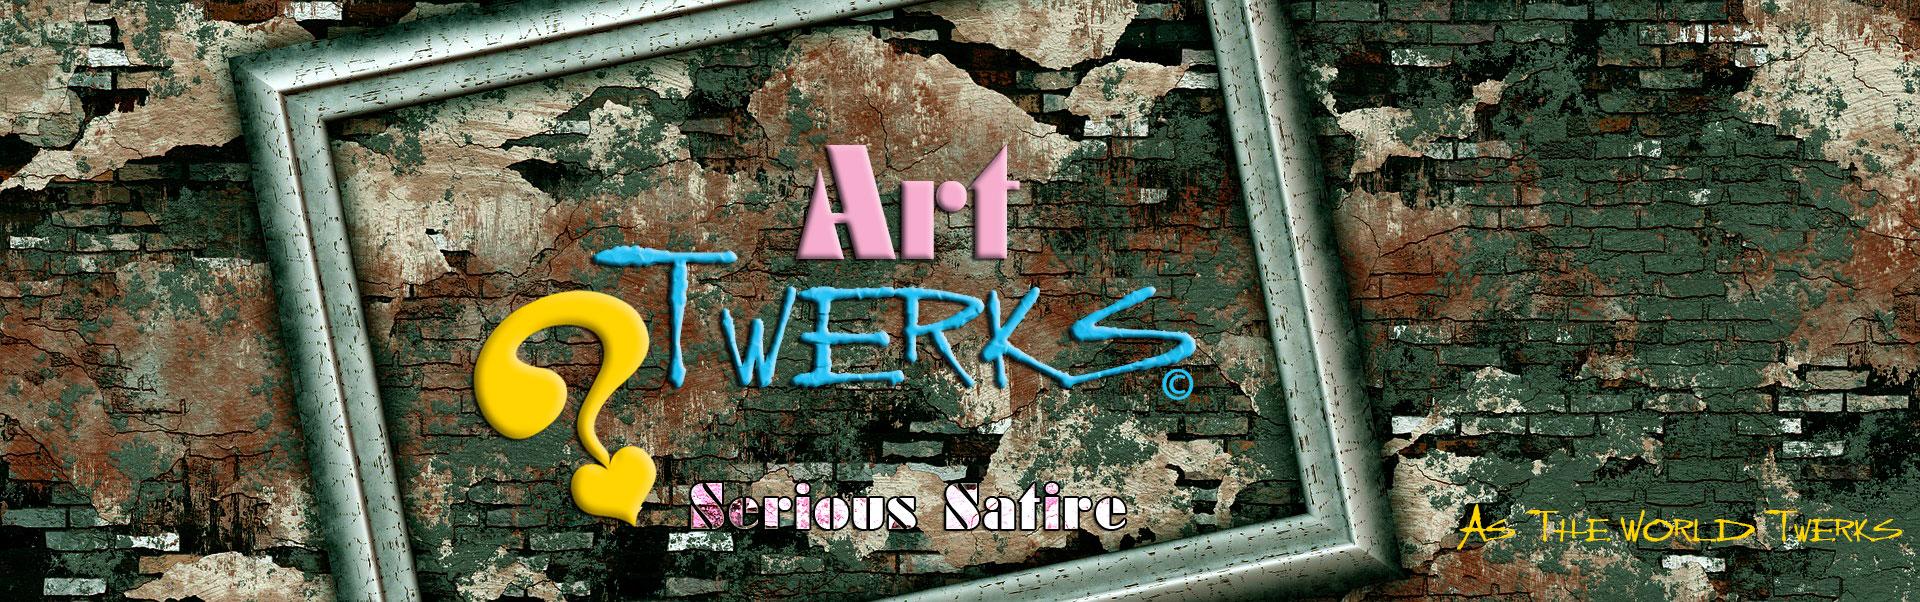 Art Twerks